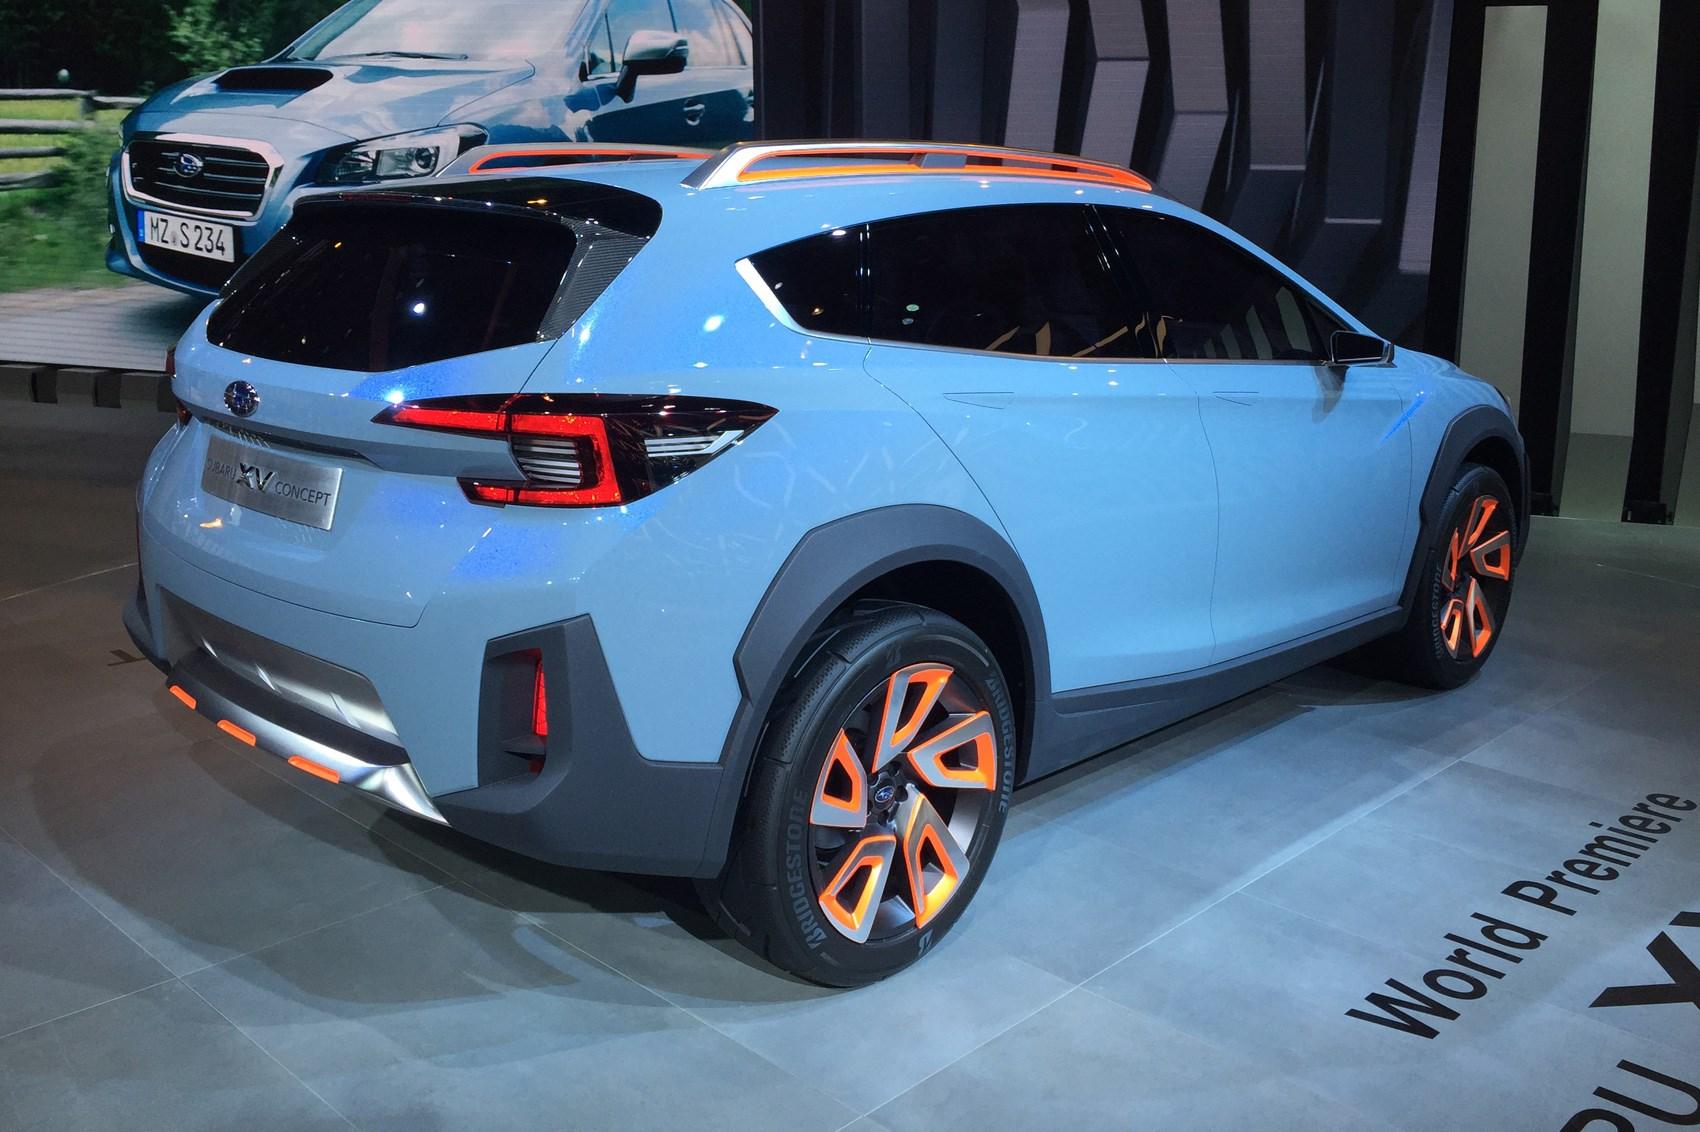 subaru xv concept revealed at 2016 geneva motor show by car magazine. Black Bedroom Furniture Sets. Home Design Ideas